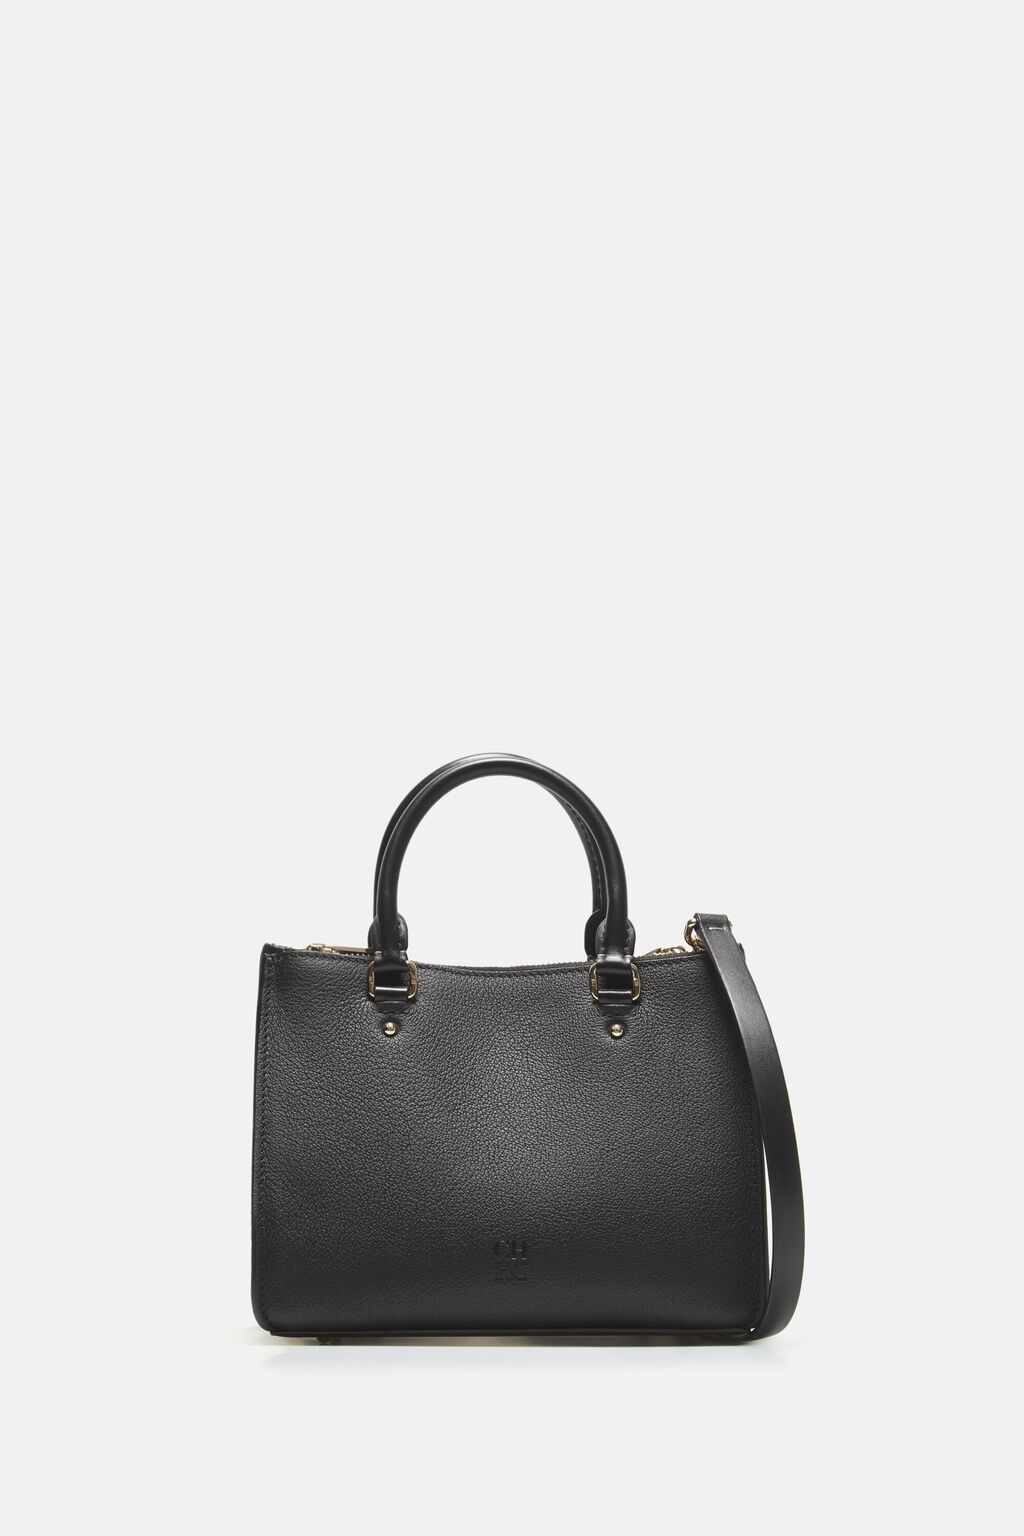 Petit Vendome Shopping | Small handbag